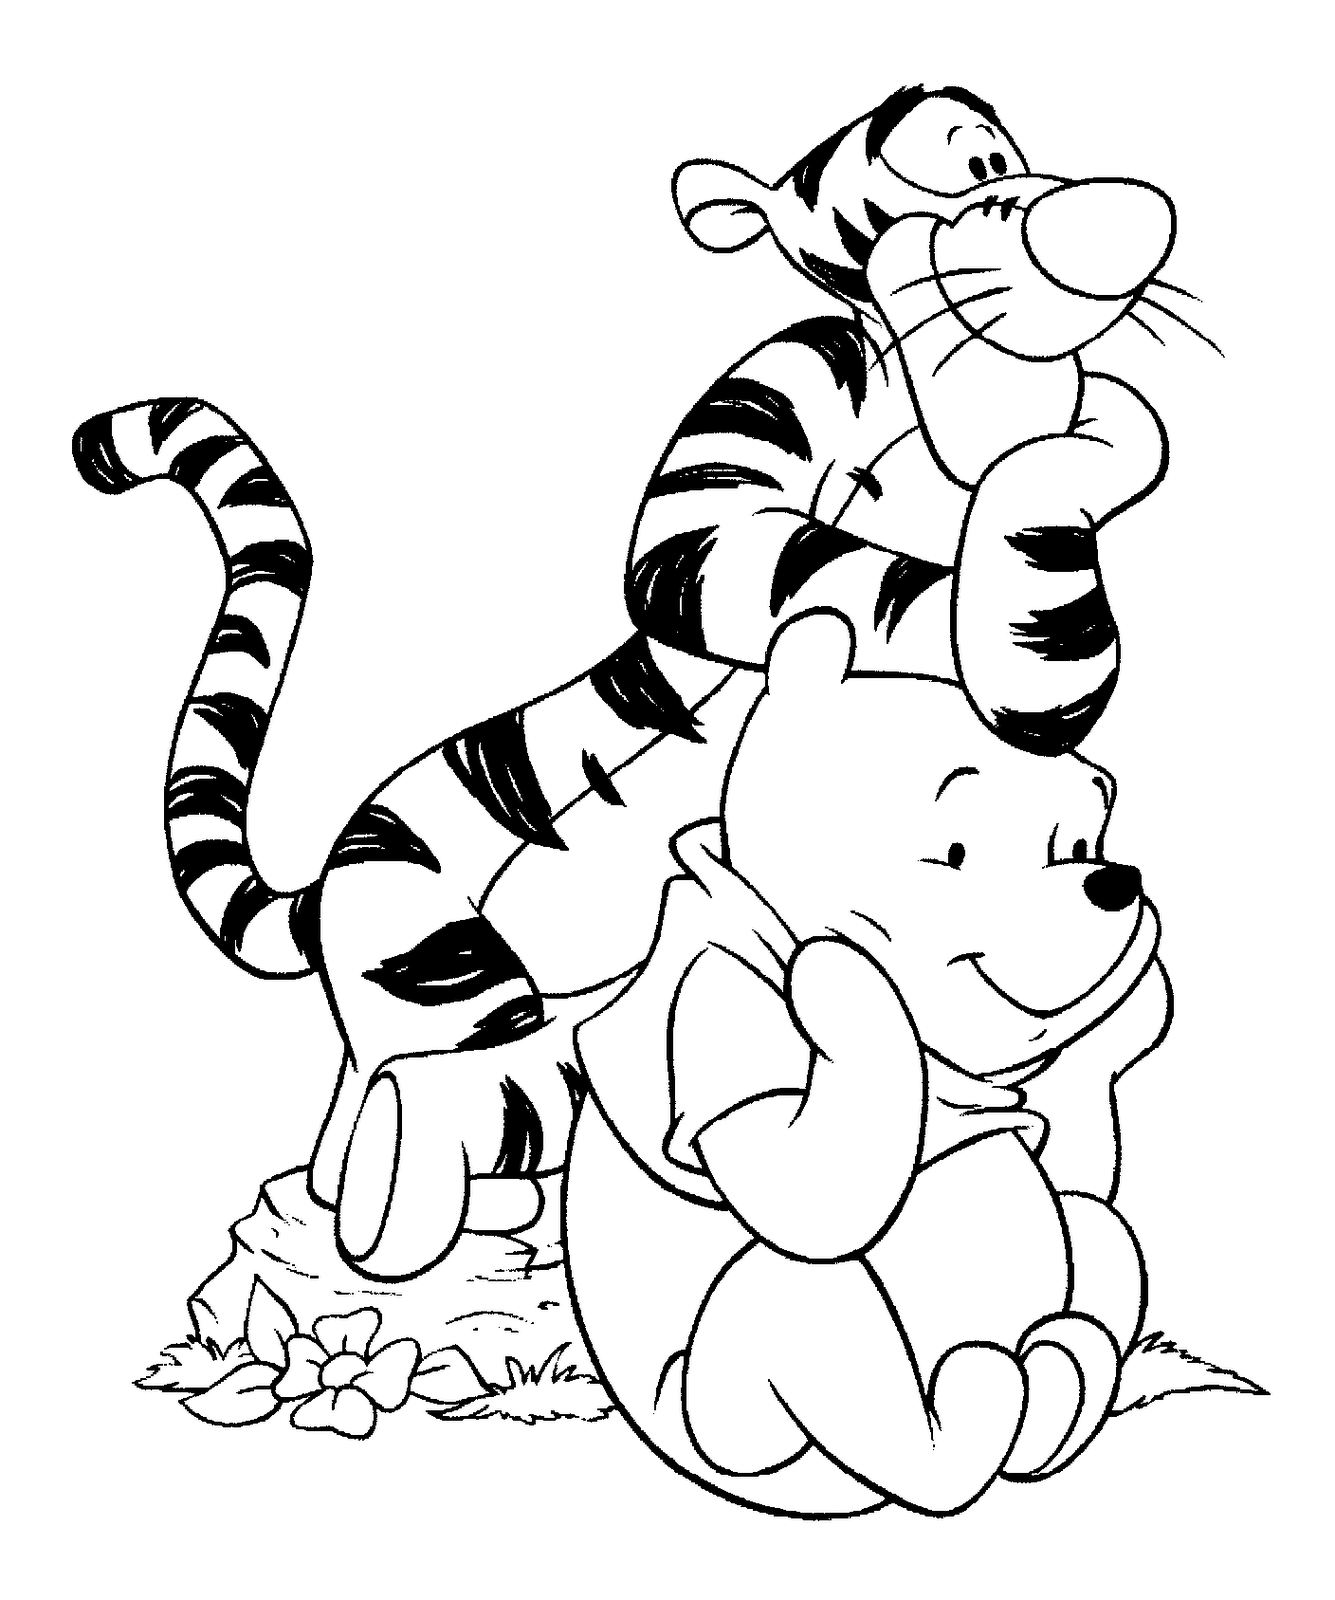 Imagenes De Muñequitos Para Dibujar Dibujos Para Colorear Online